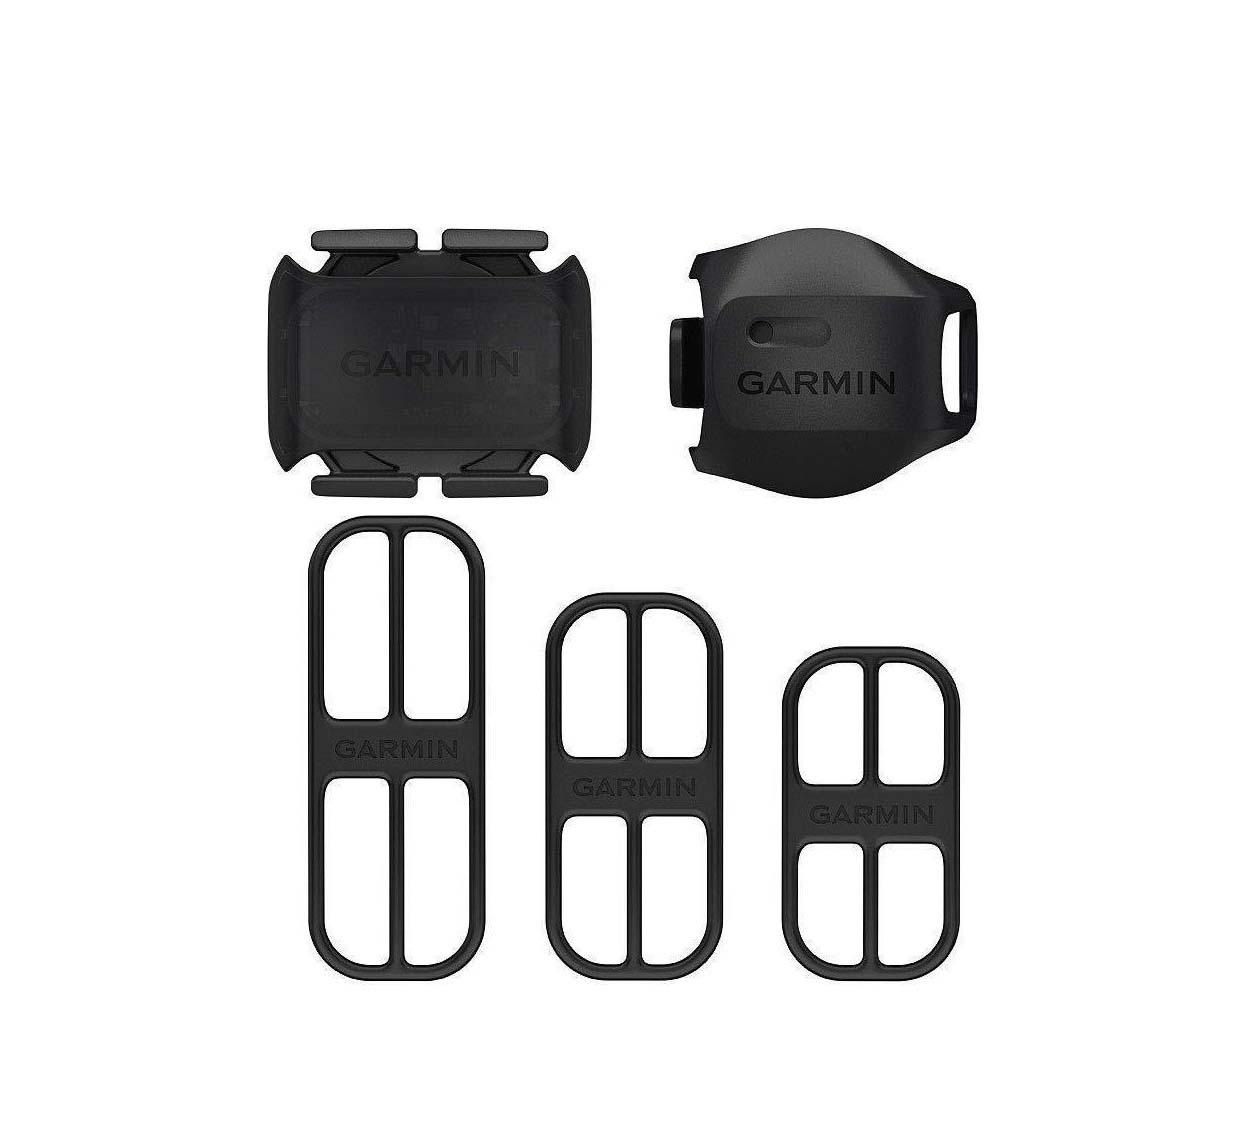 Garmin Bike Speed Sensor 2 & Cadence Sensor 2 010-12845-00